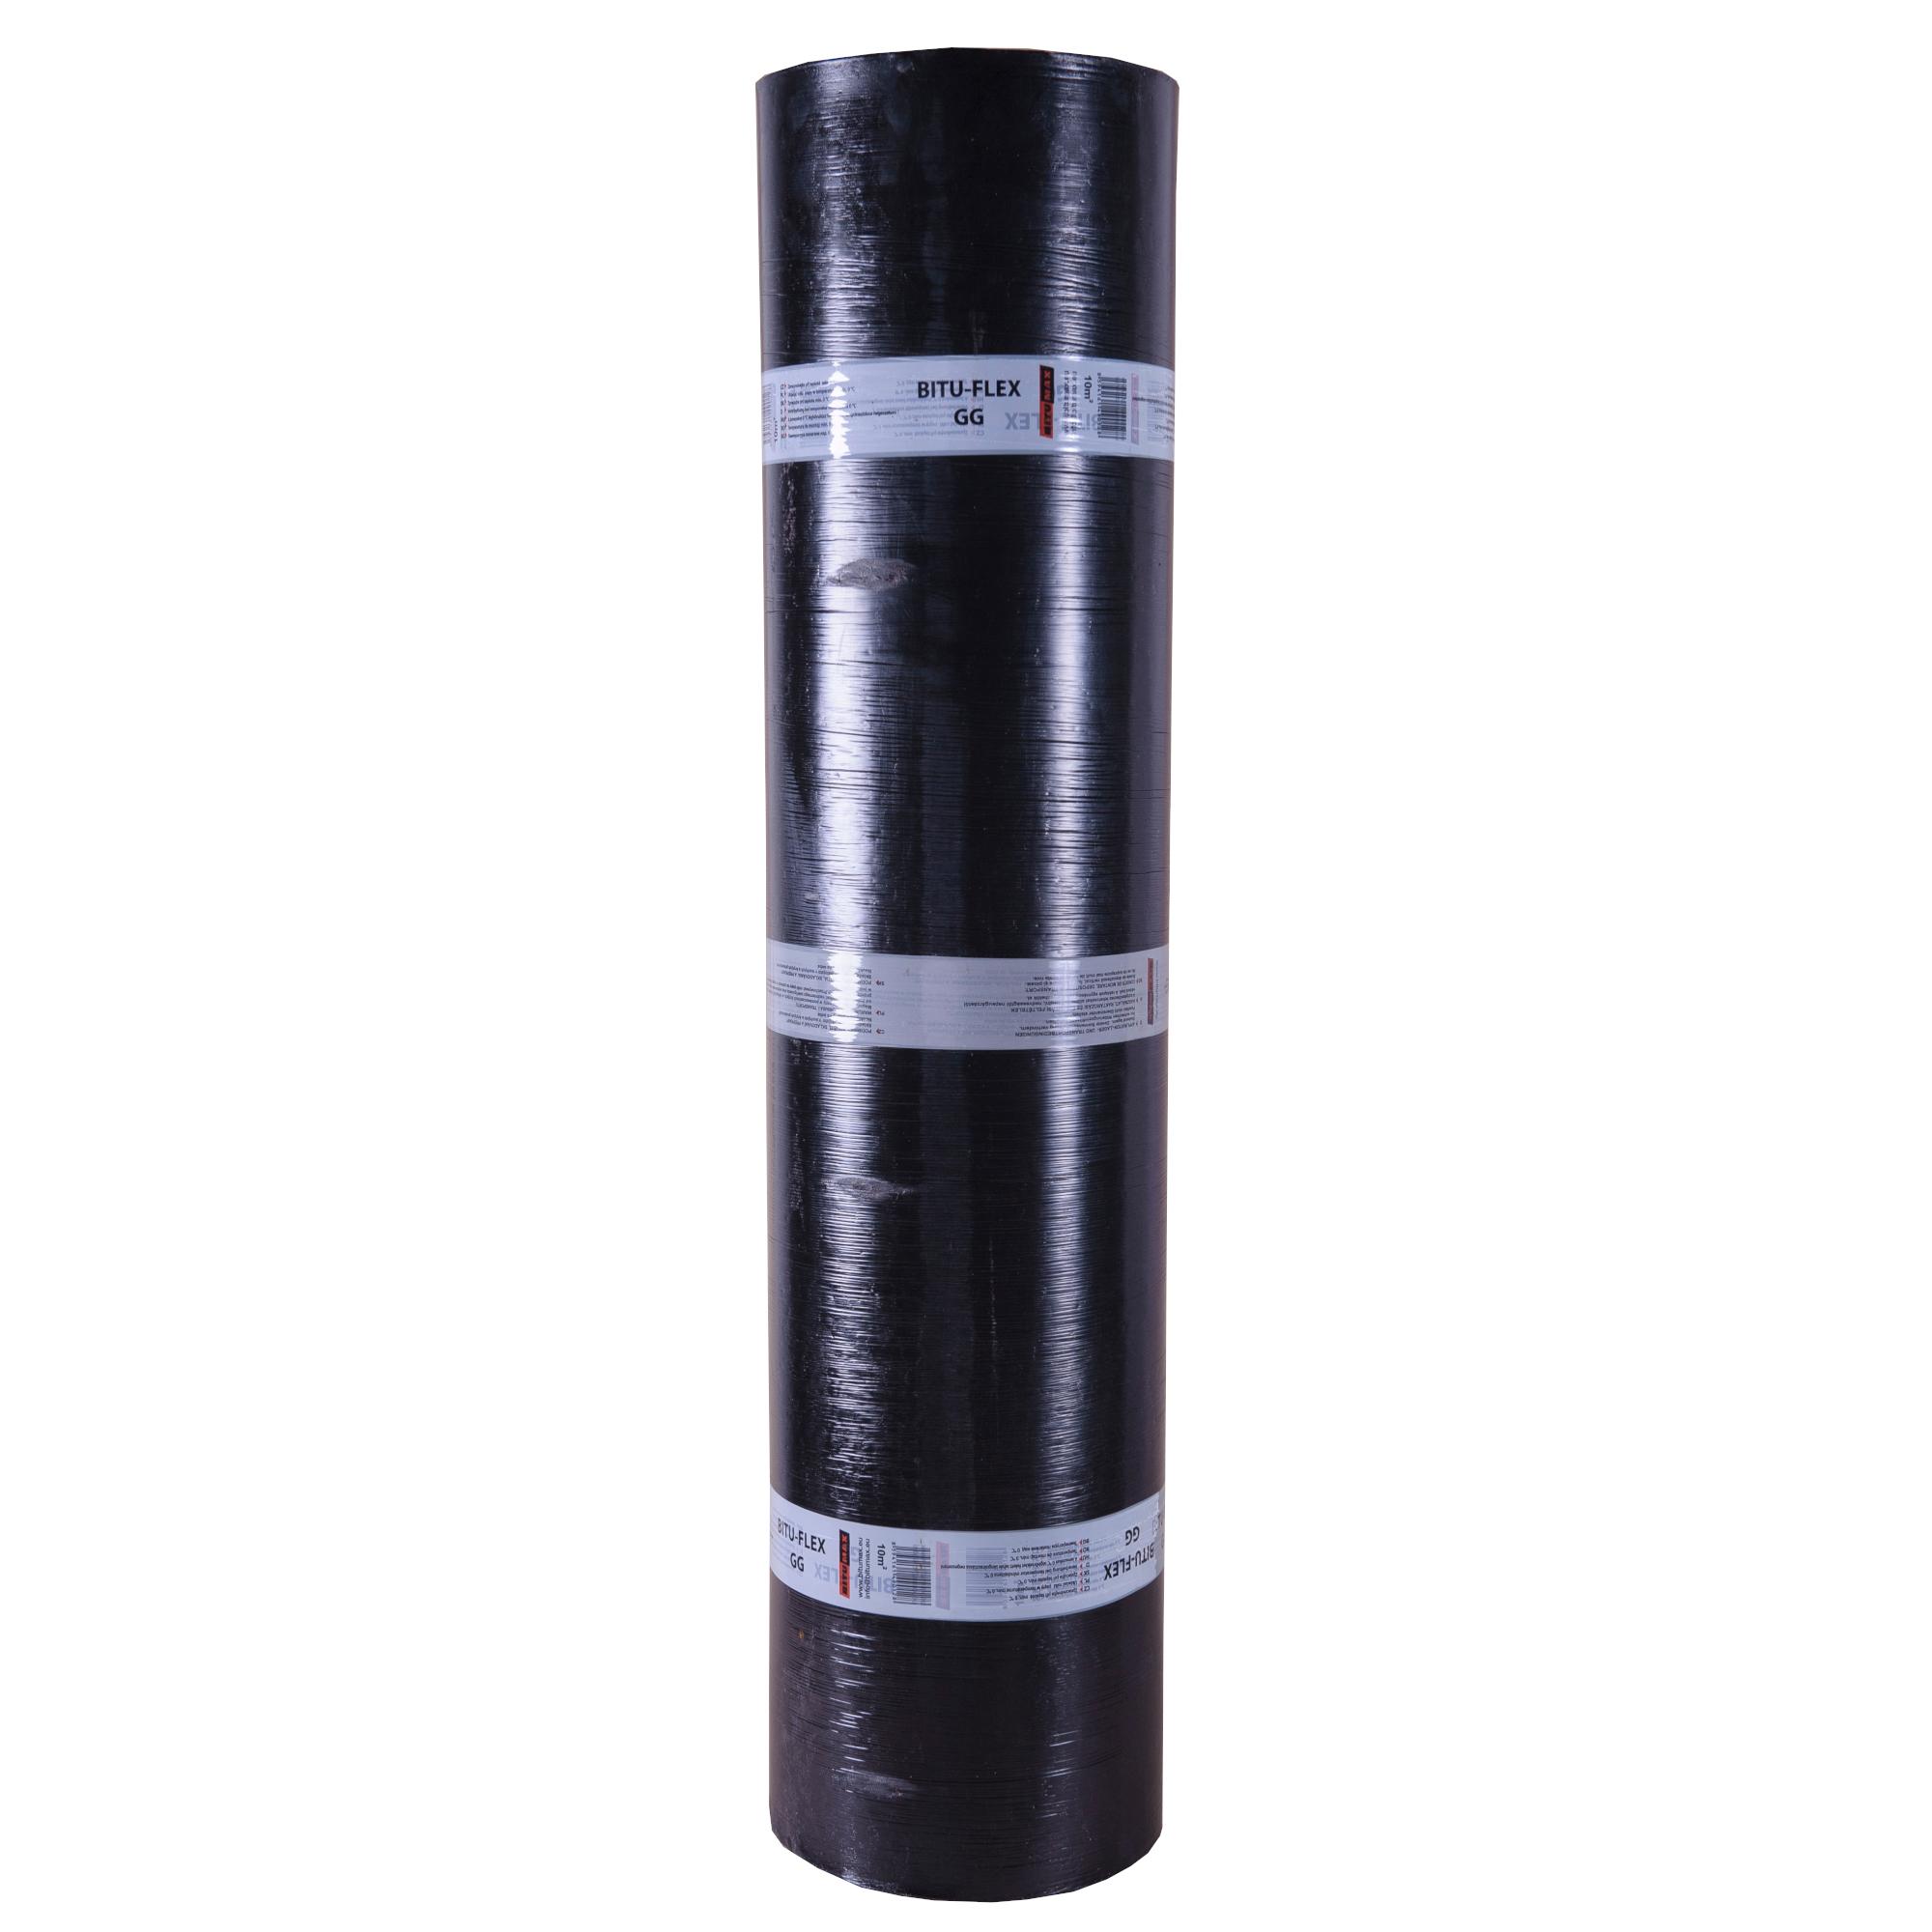 Hydroizolační asfaltový pás BITU-FLEX GG (role/10 m2)